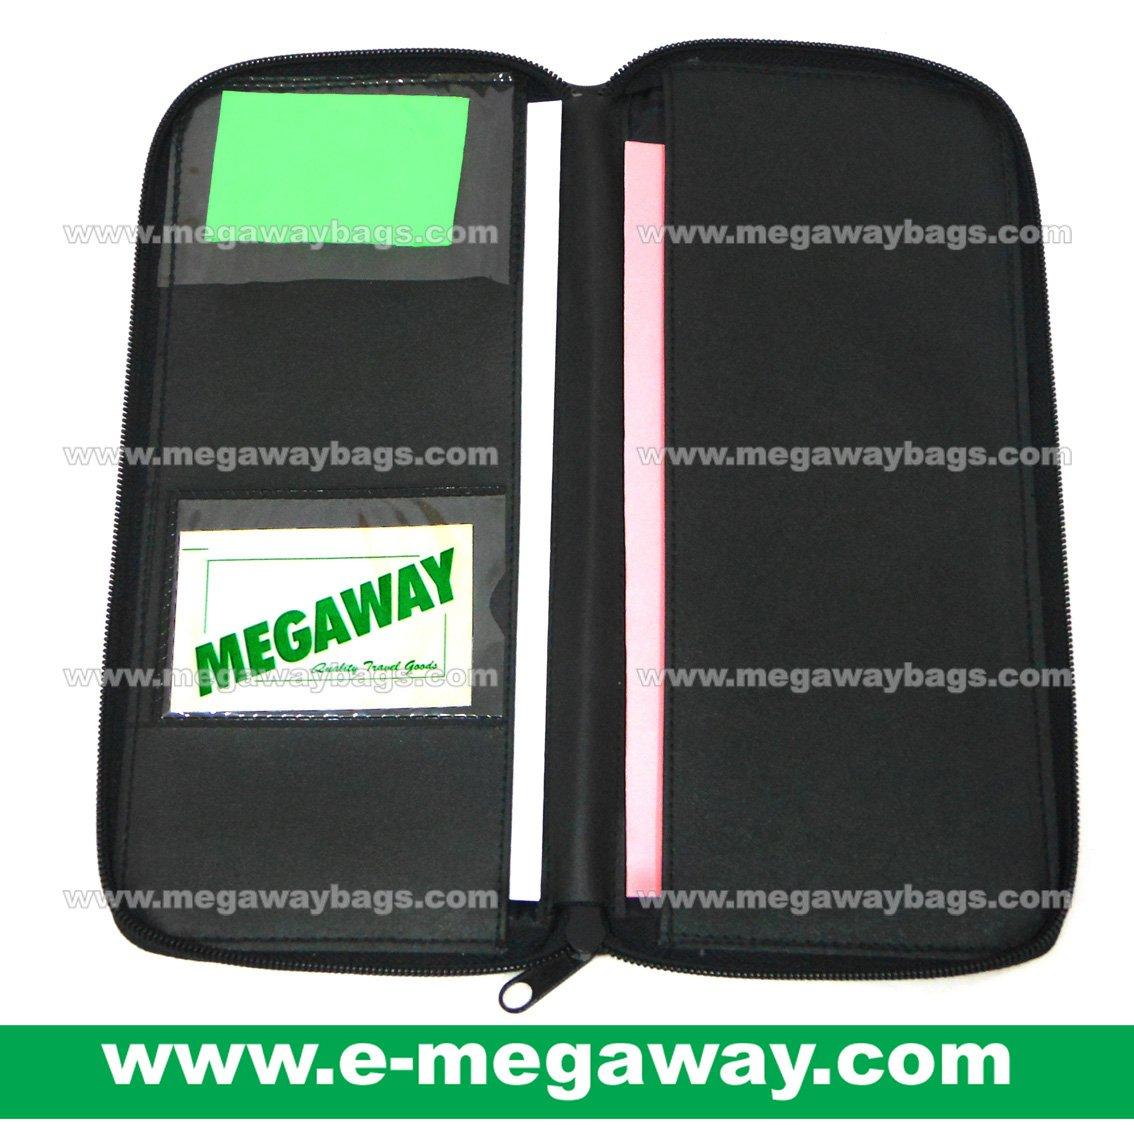 Travel Wallets Bag Money Air Tickets Credit Cards Passport Organizer MegawayBags #CC-0933A-7282